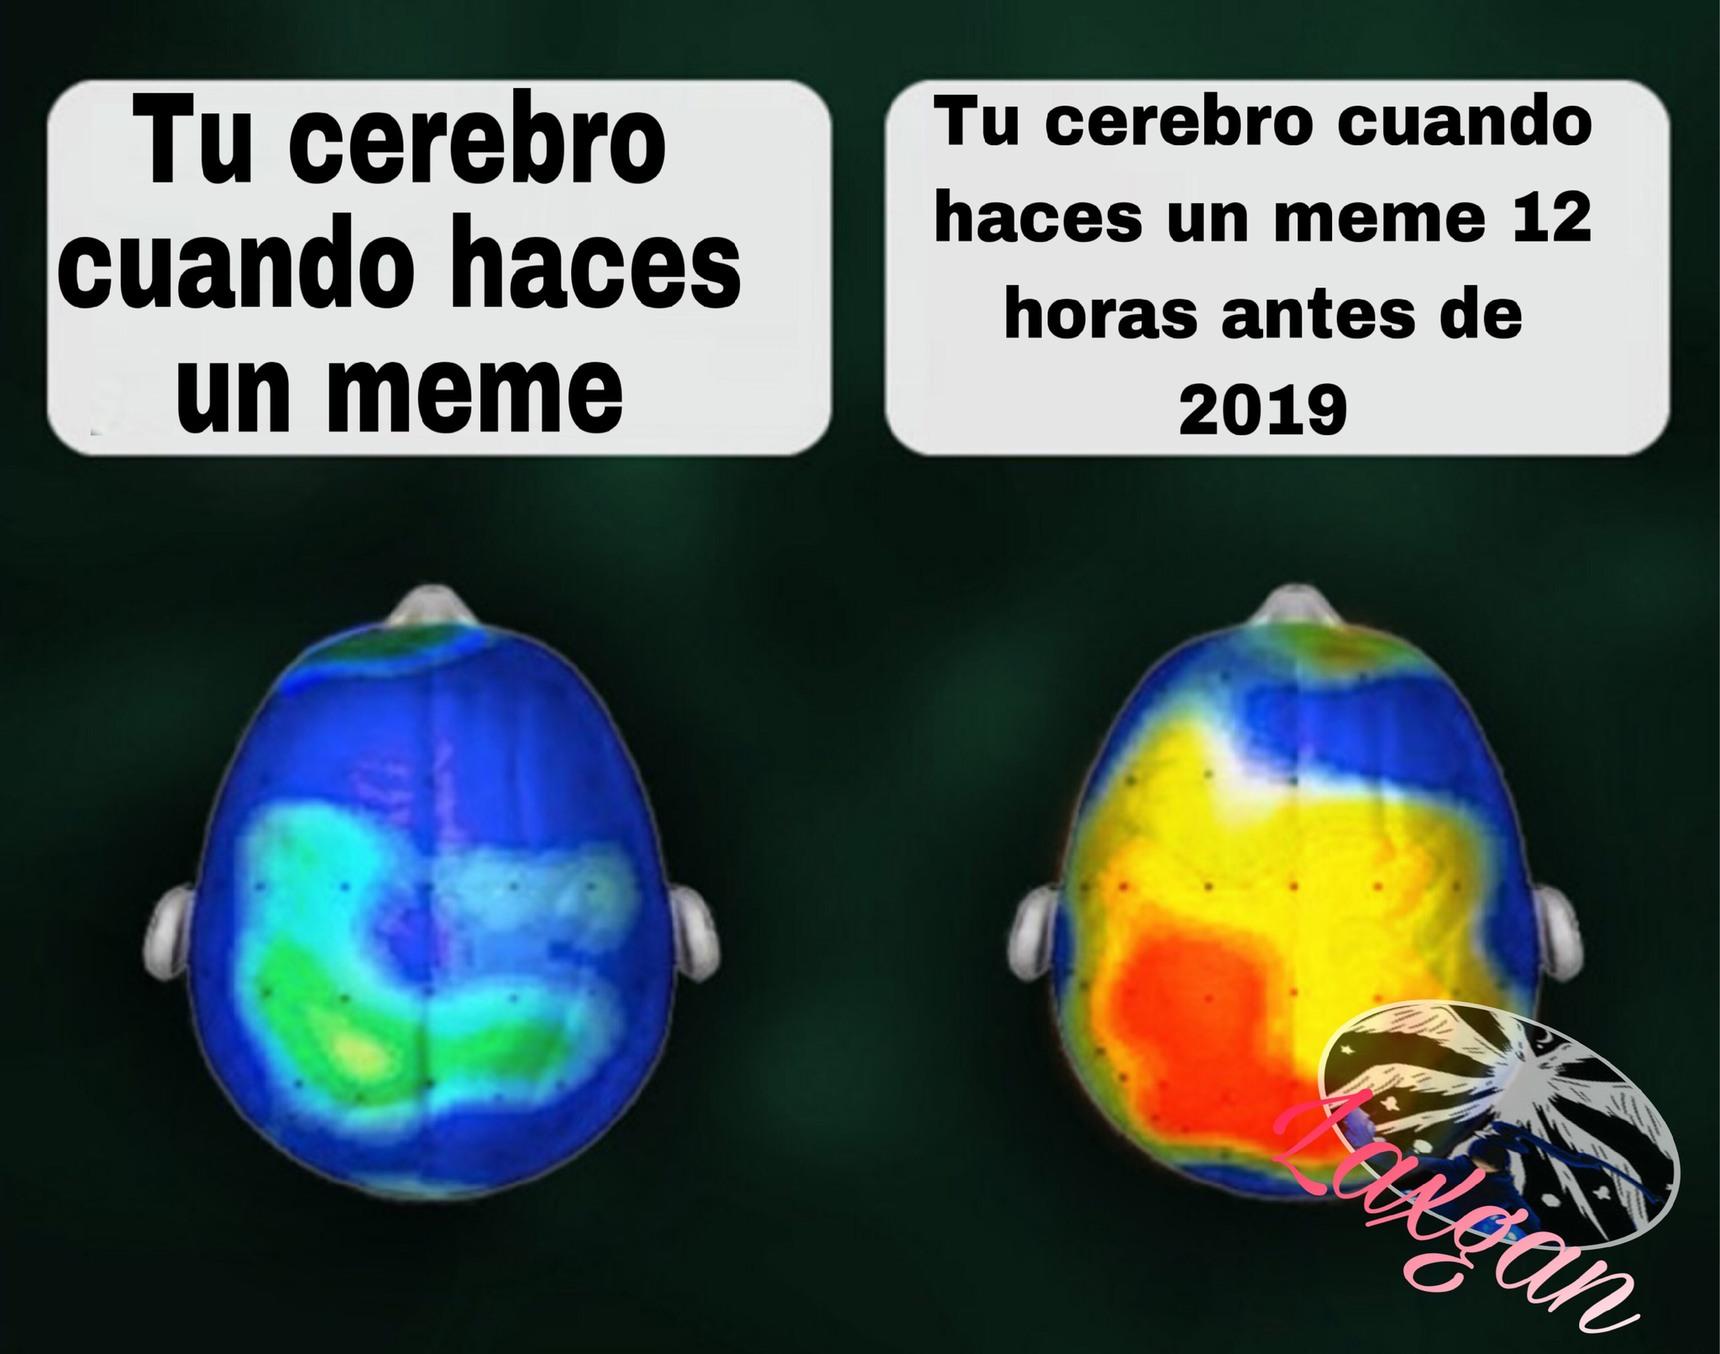 Feliz año nuevo ^^ - meme